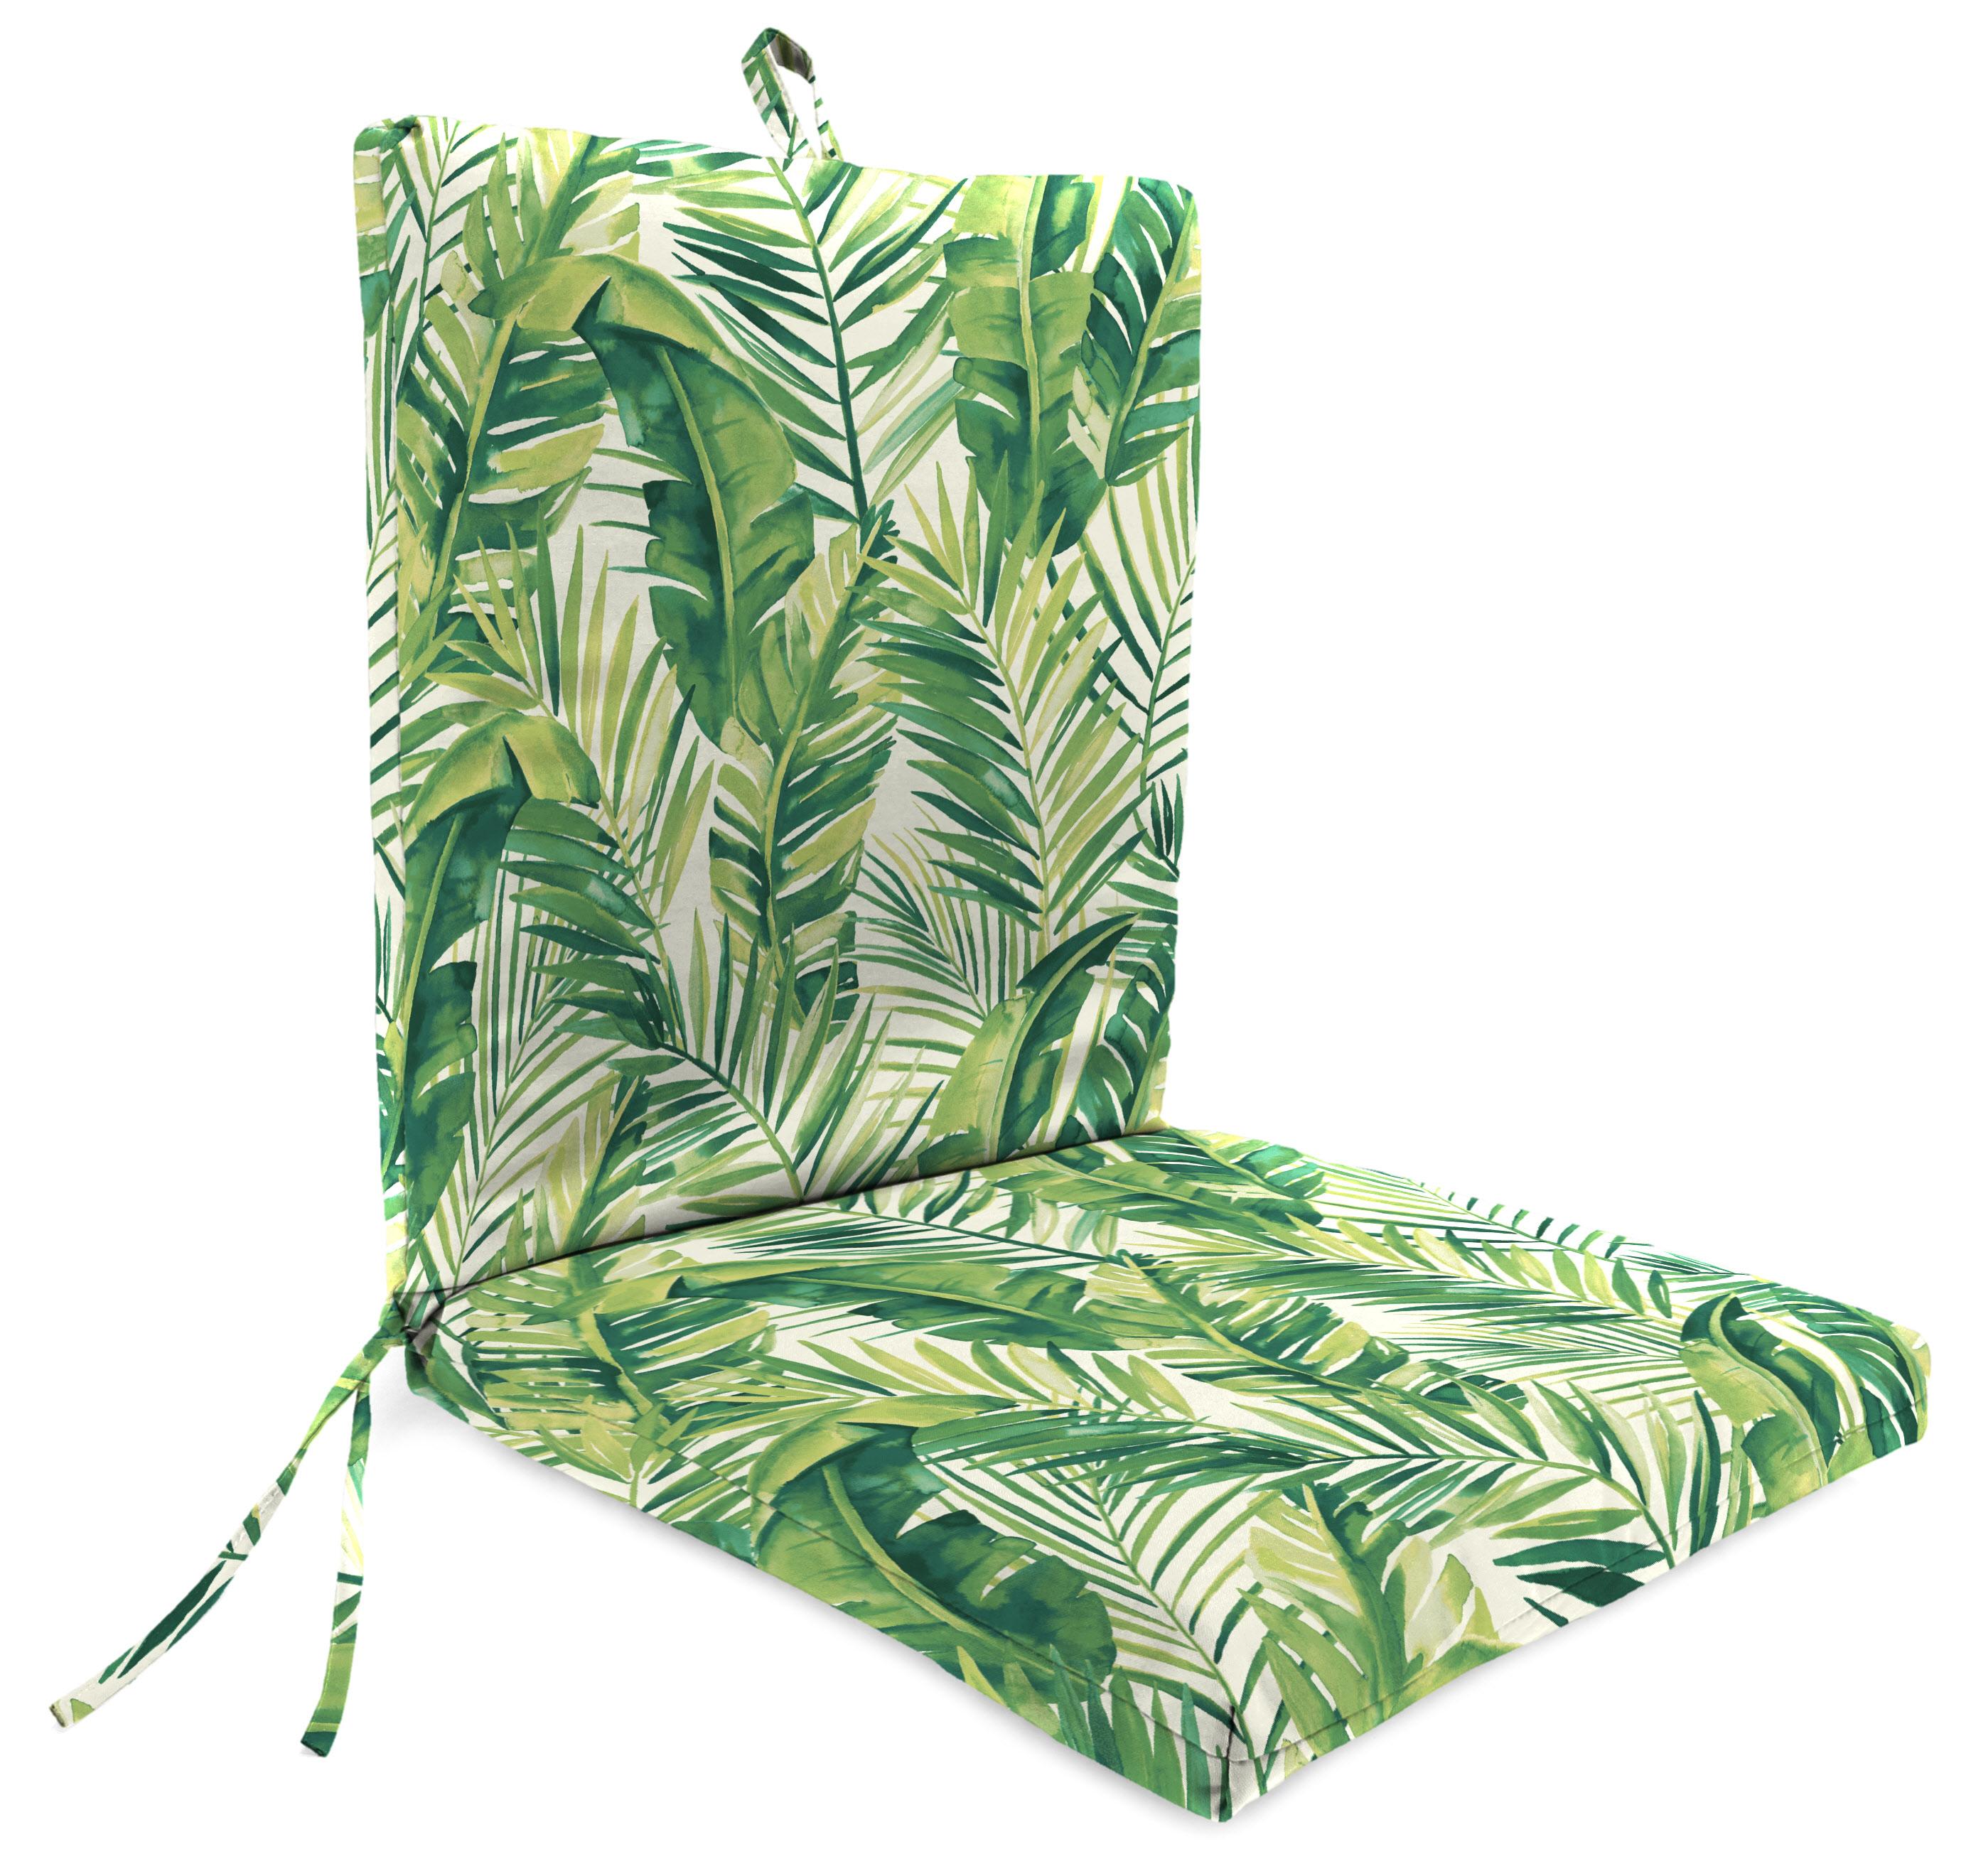 mainstays chair cushion palm leaf